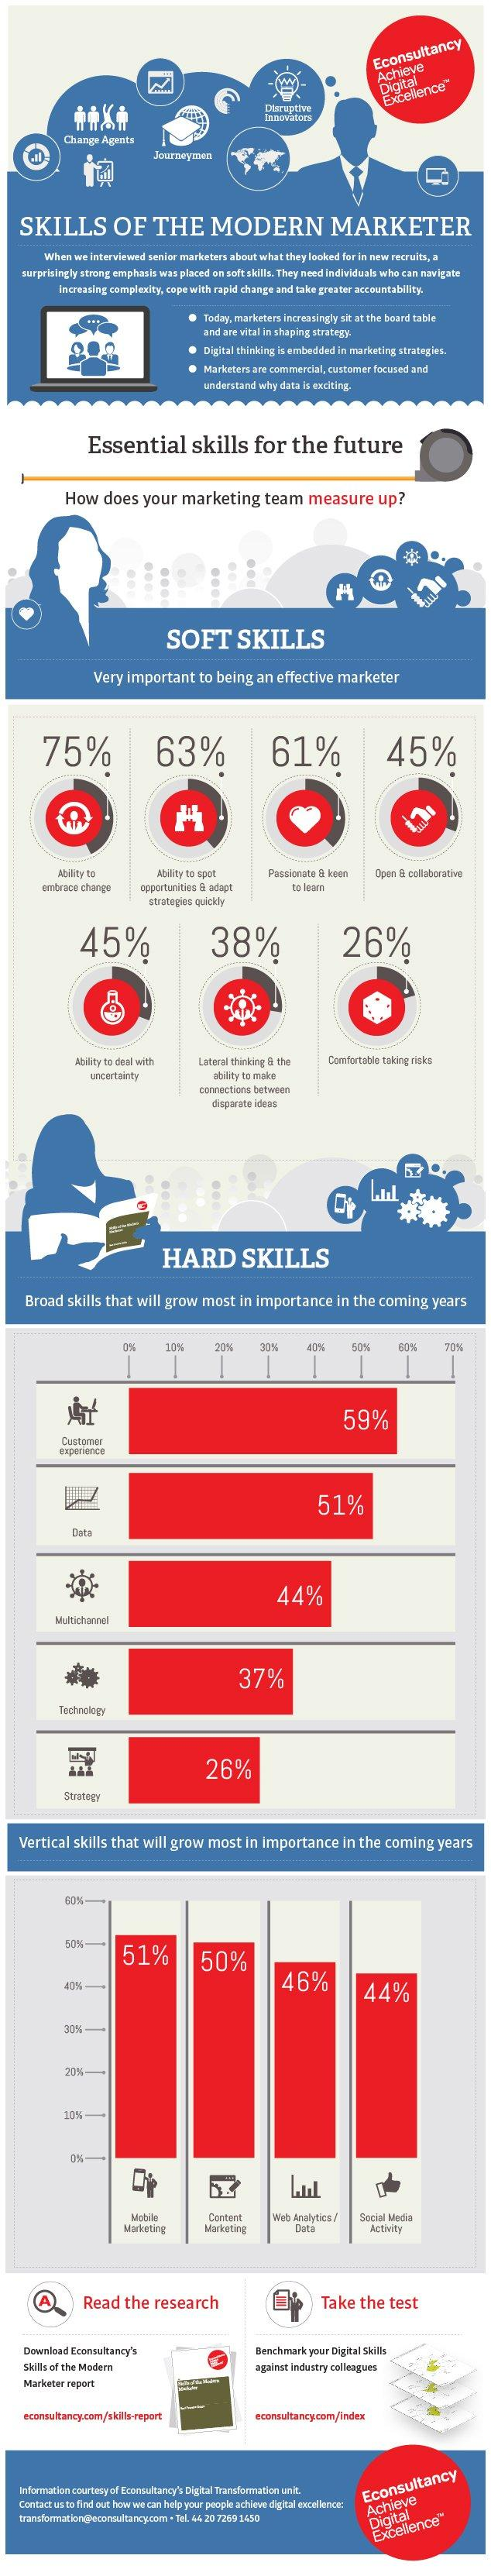 skills of the modern marketer